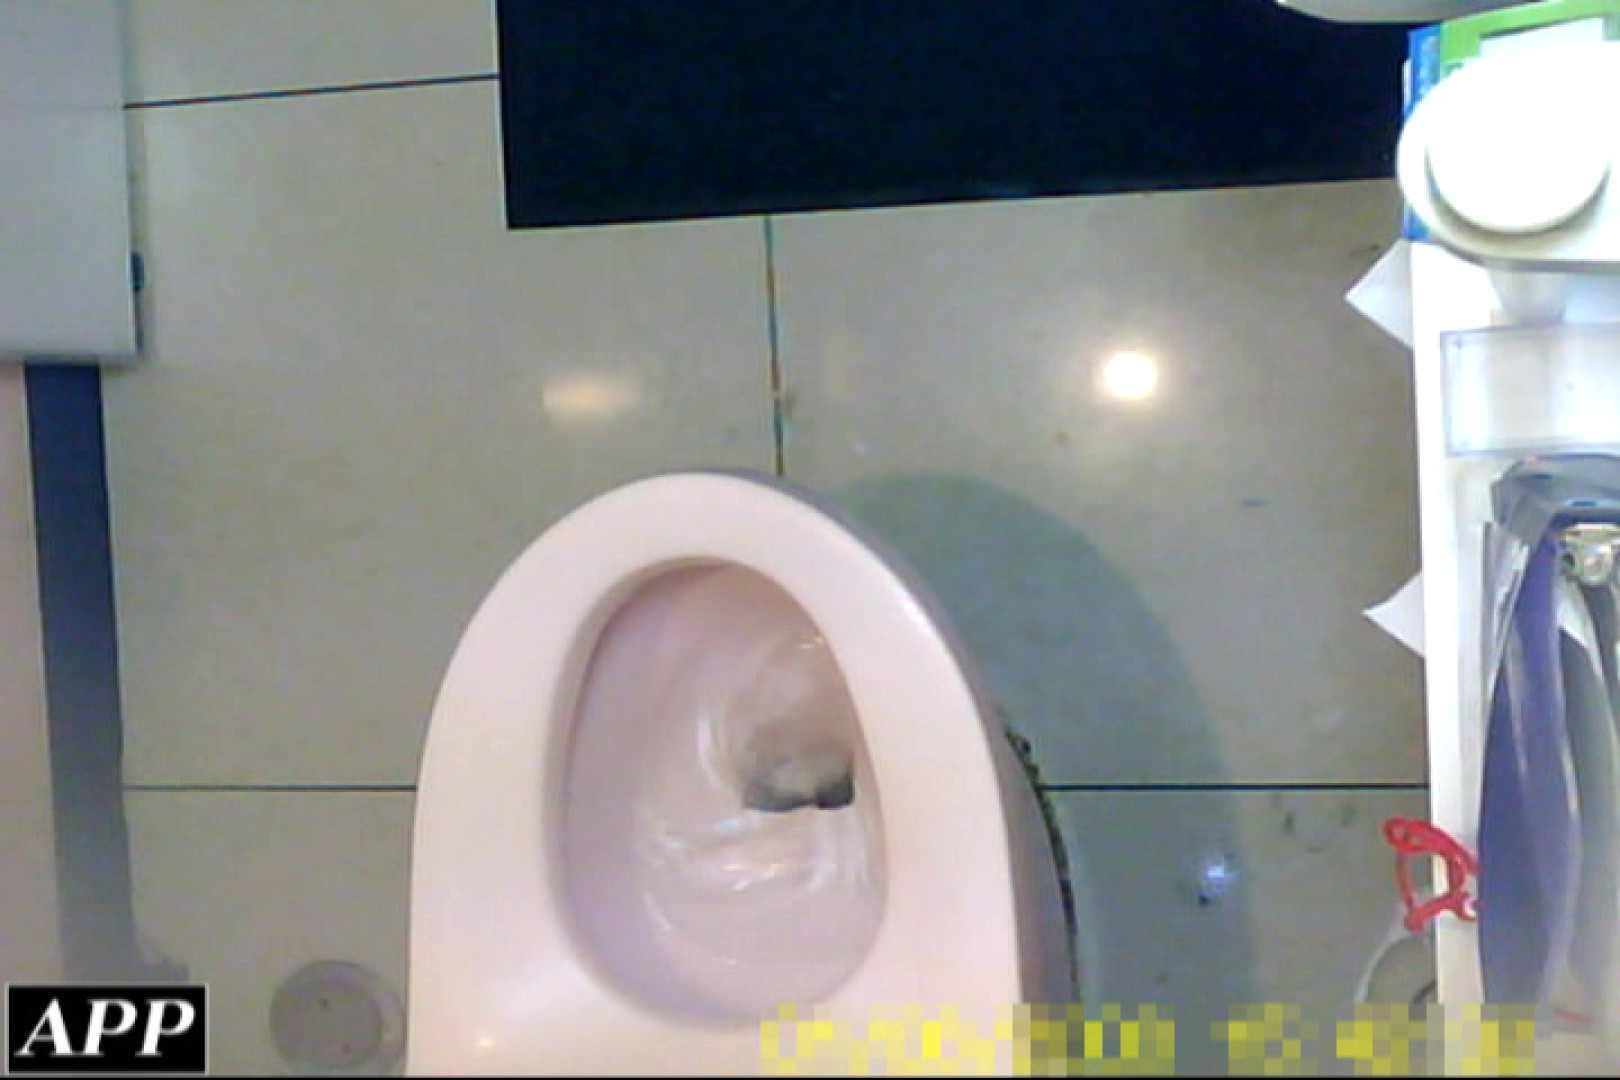 3視点洗面所 vol.092 洗面所 | OLセックス  101画像 59